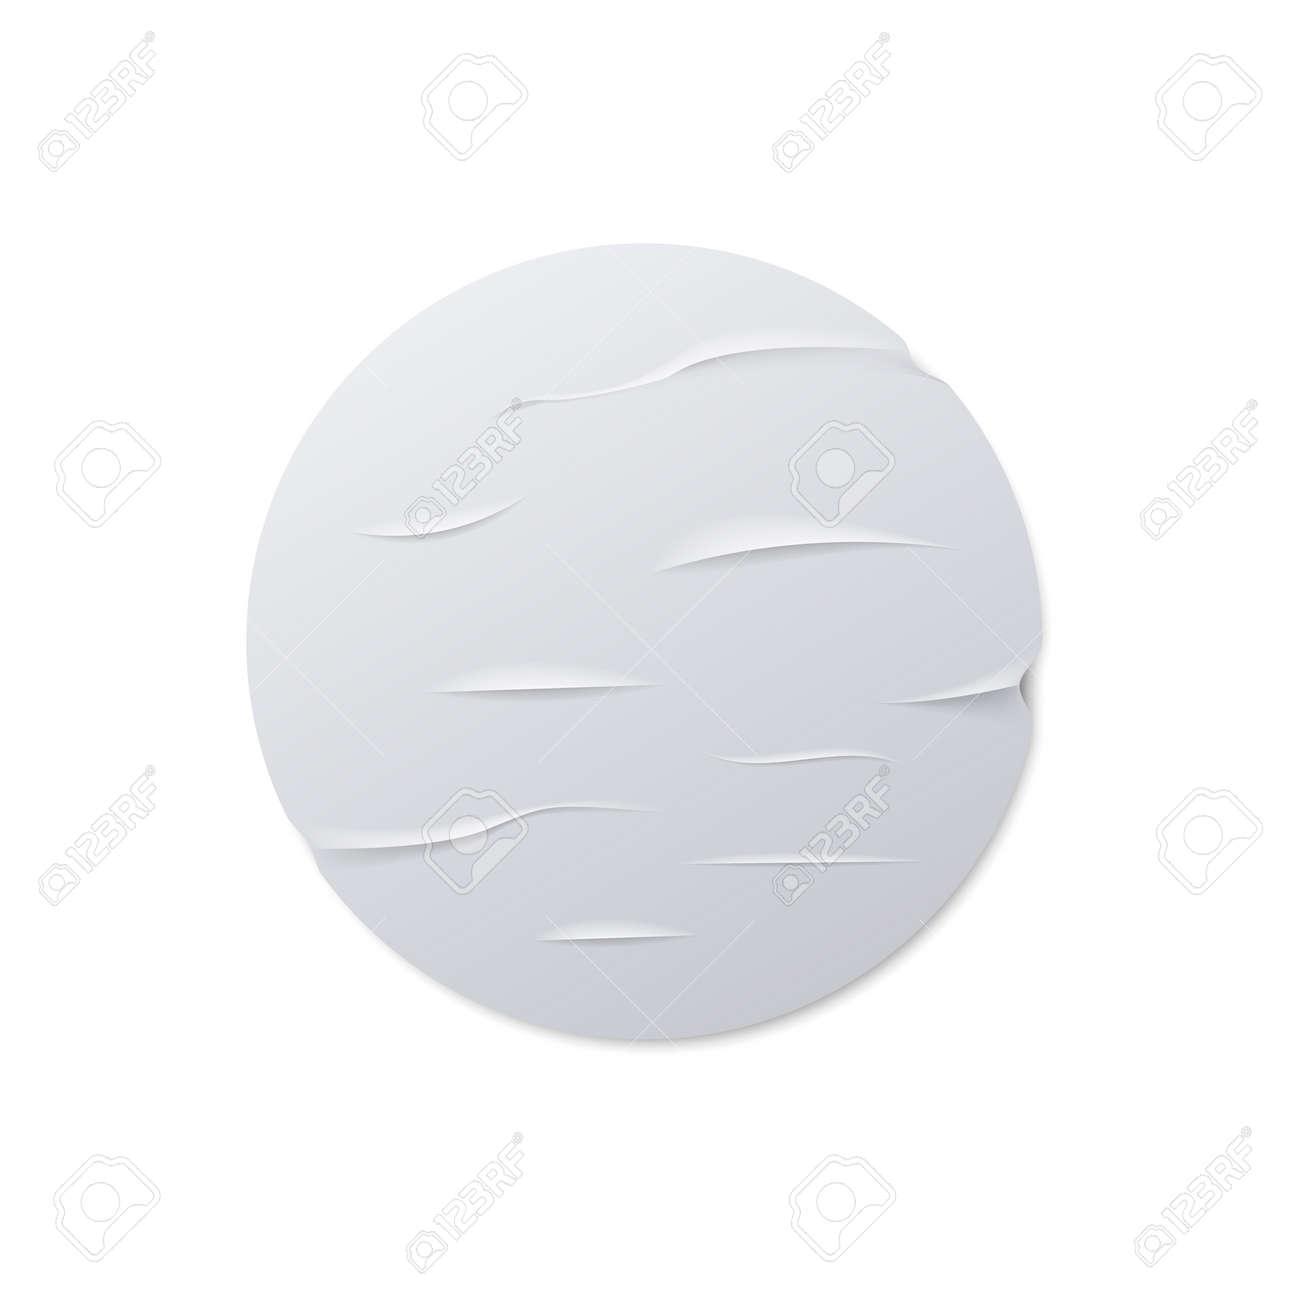 Round crumpled sticker mock up. Vector illustration. - 164872142